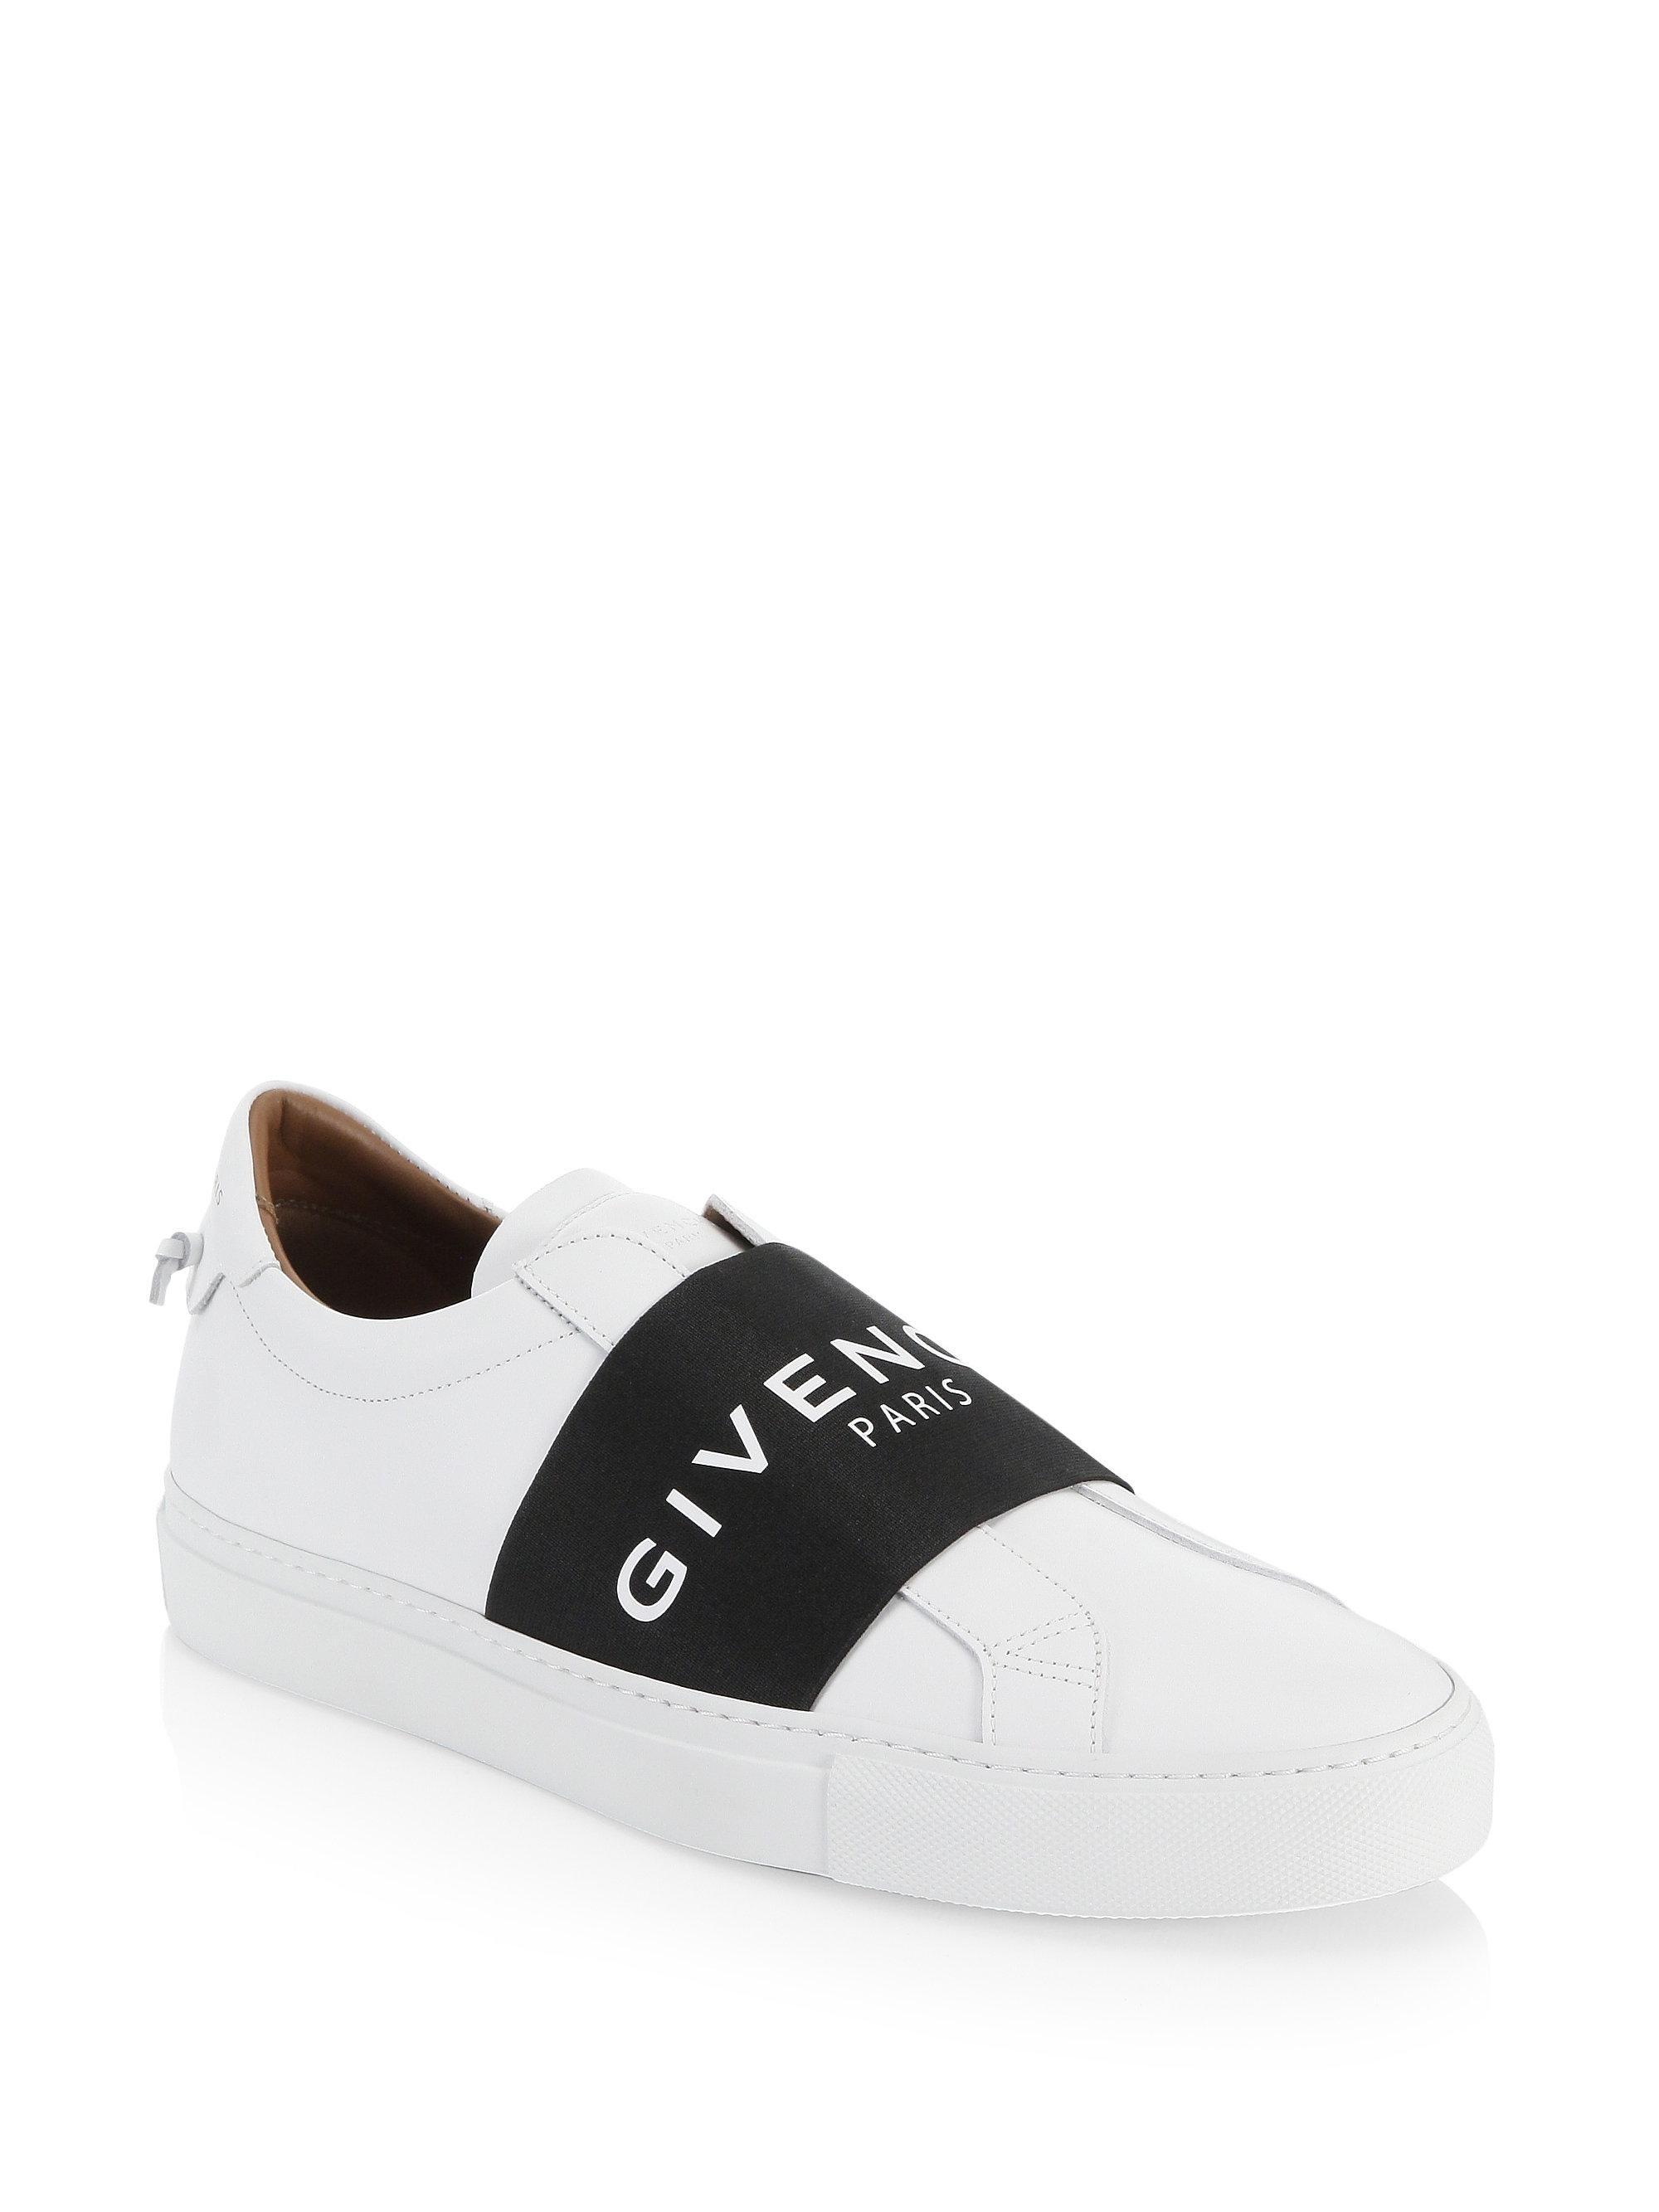 Givenchy Silver Metallic Knit Logo Sneakers 7mRcoa6PL